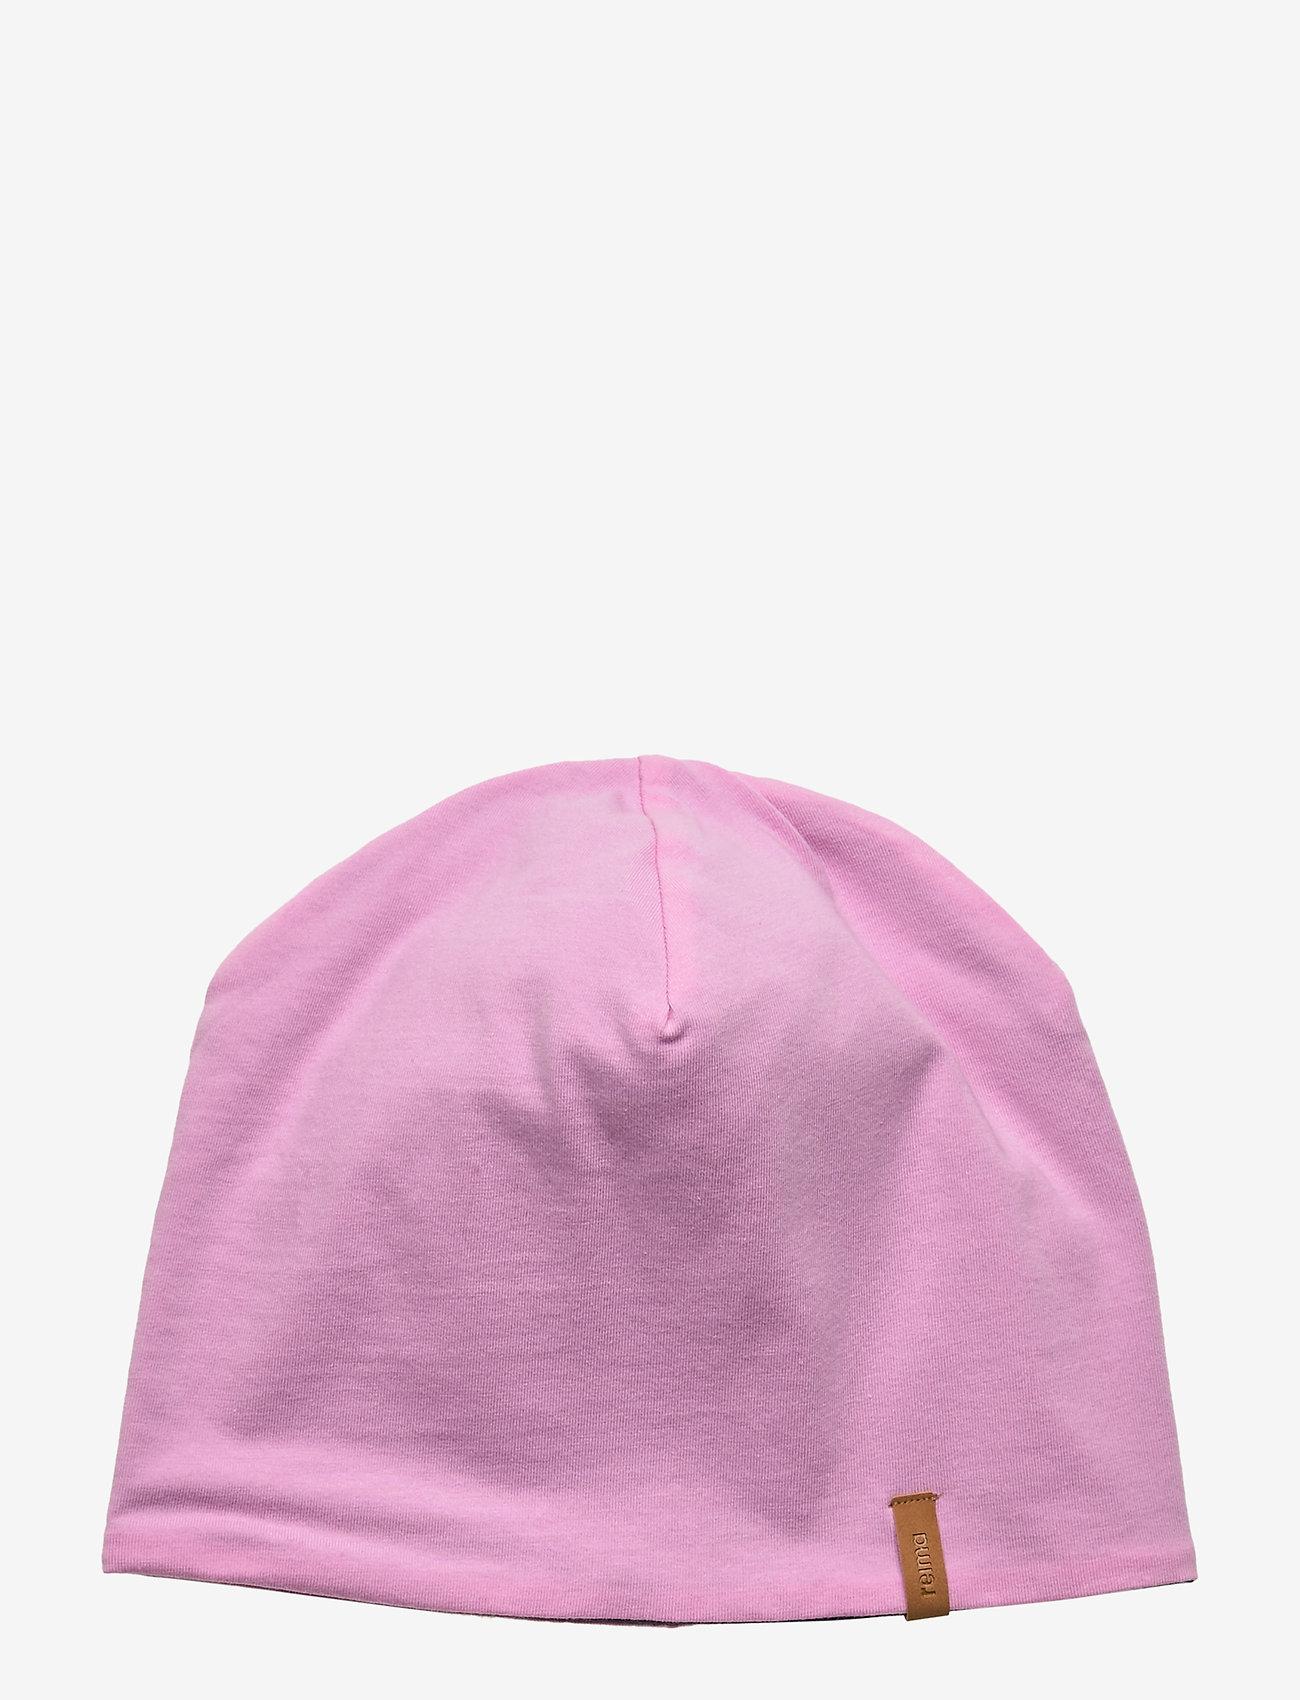 Reima - Tanssi - huer - rose pink - 0